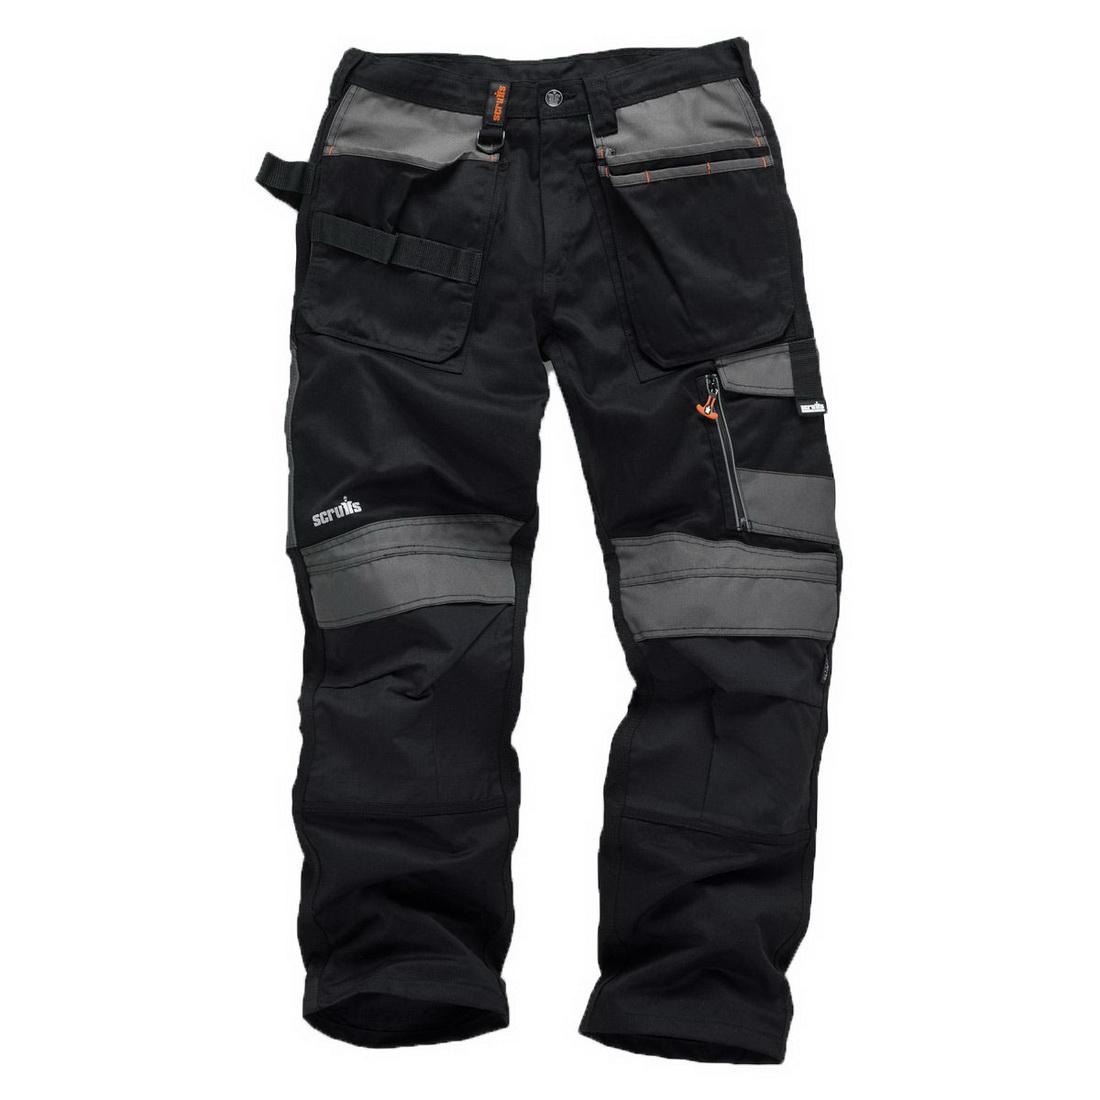 3D Trade Work Trouser 34in Black T51974